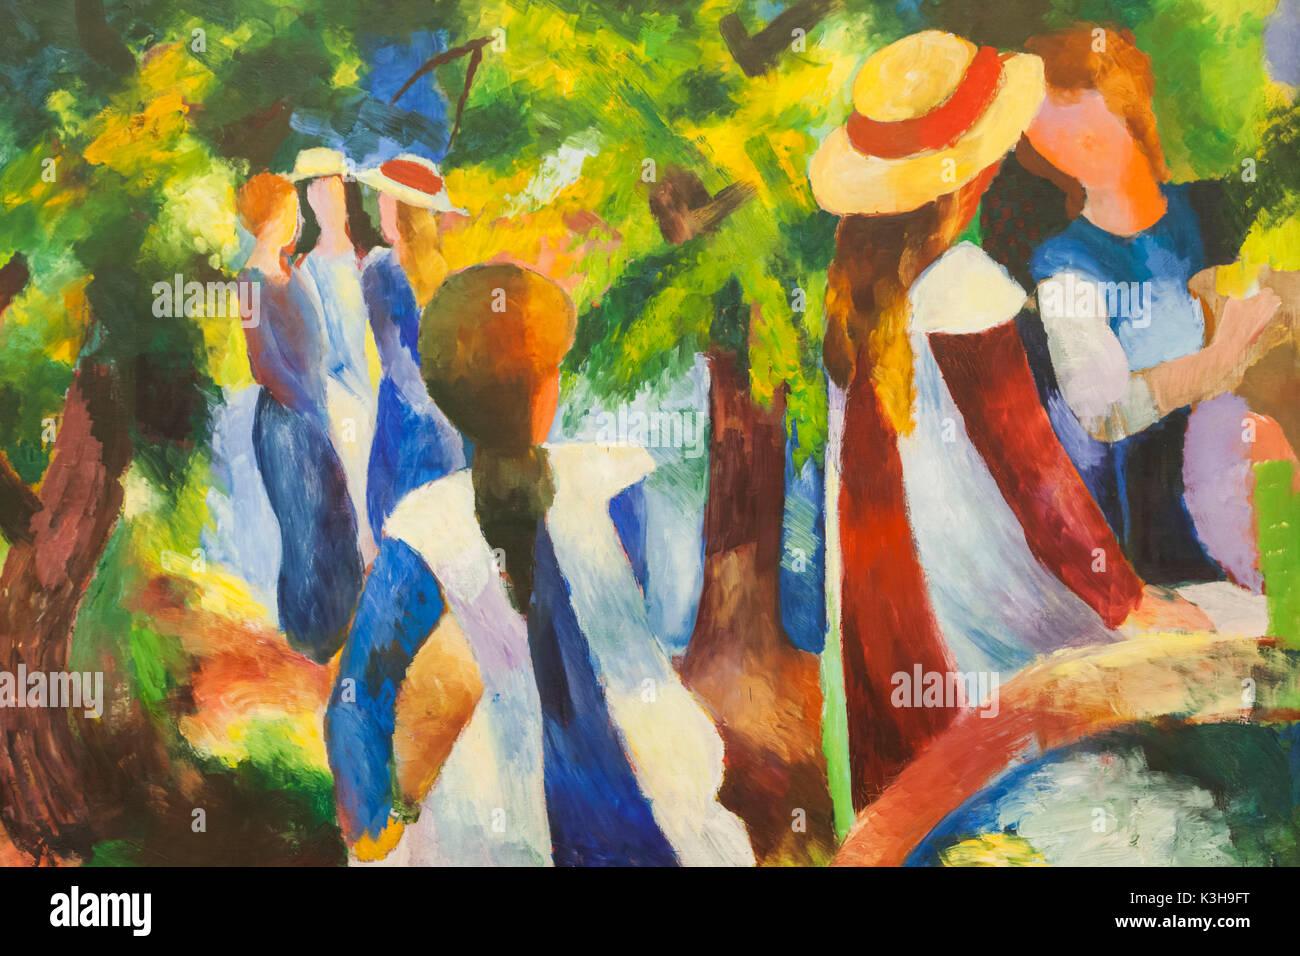 Germany, Bavaria, Munich, The Pinakothek Museum of Modern Art (Pinakothek der Moderne), Painting titled 'Madchen unter Baumen' by August Macke dated 1914 - Stock Image